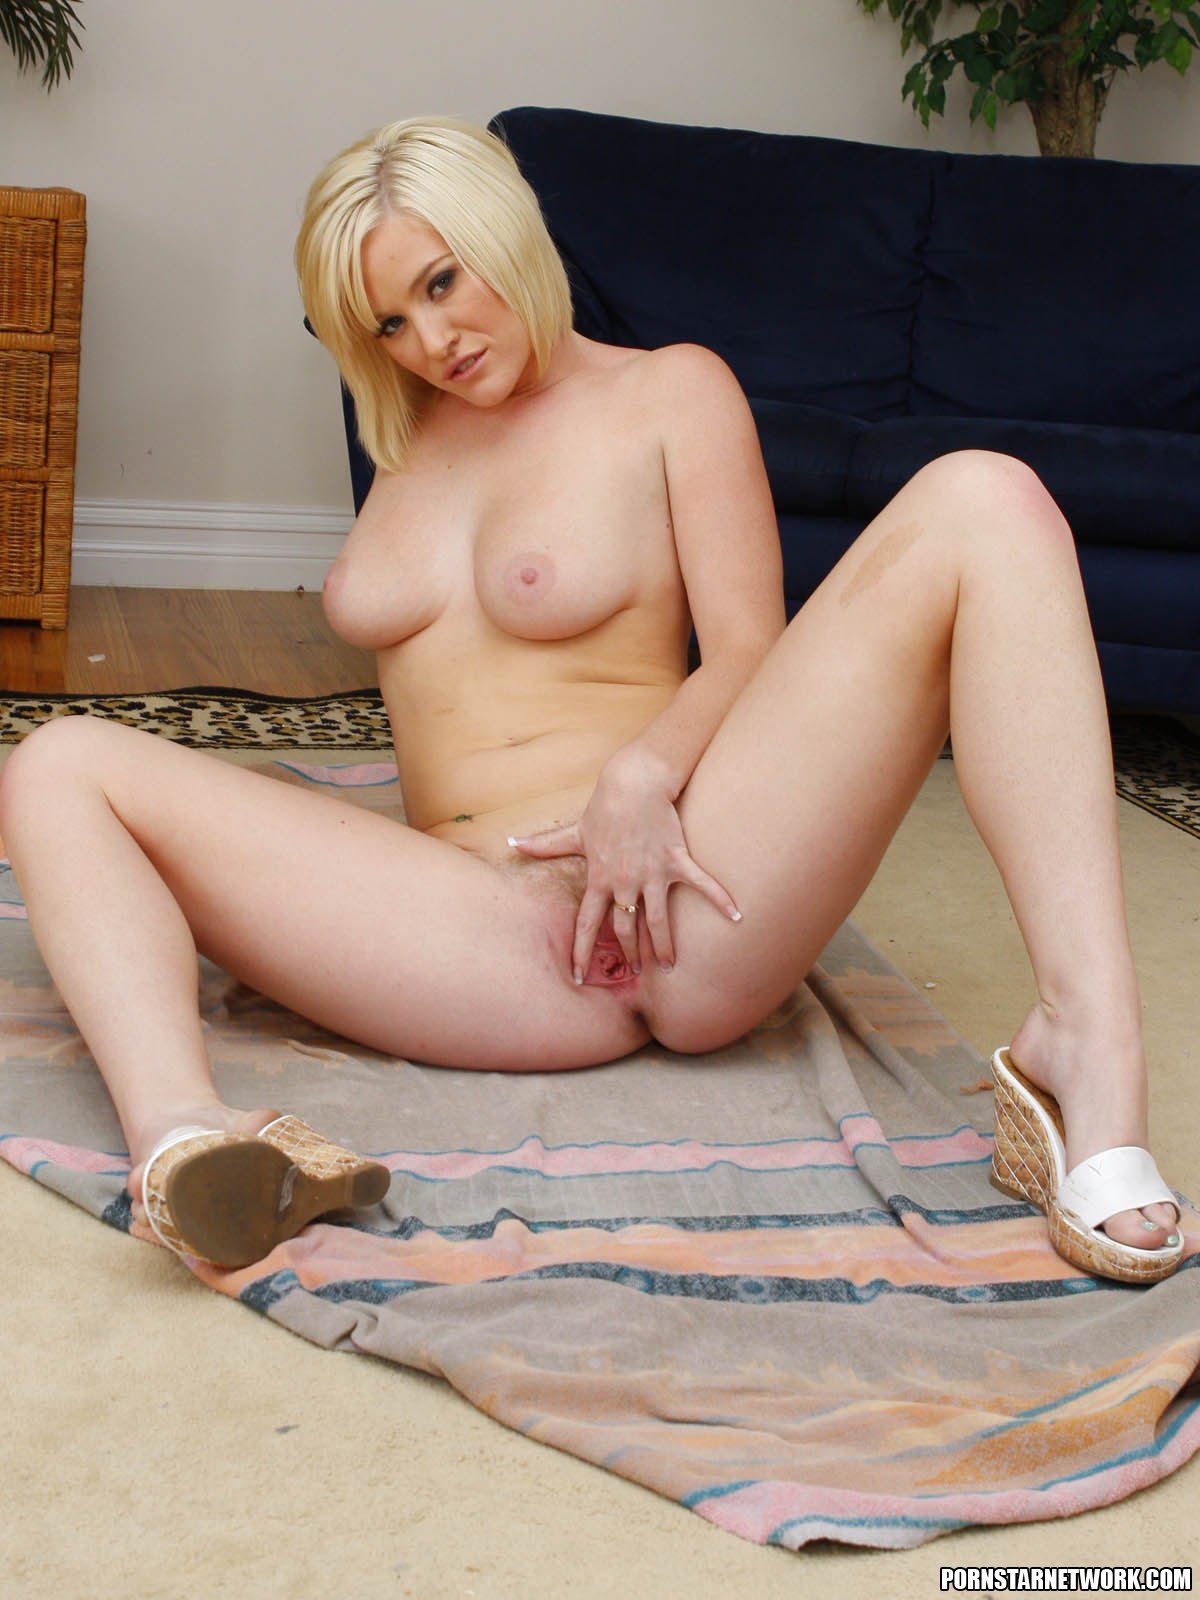 Naomi cruz porn